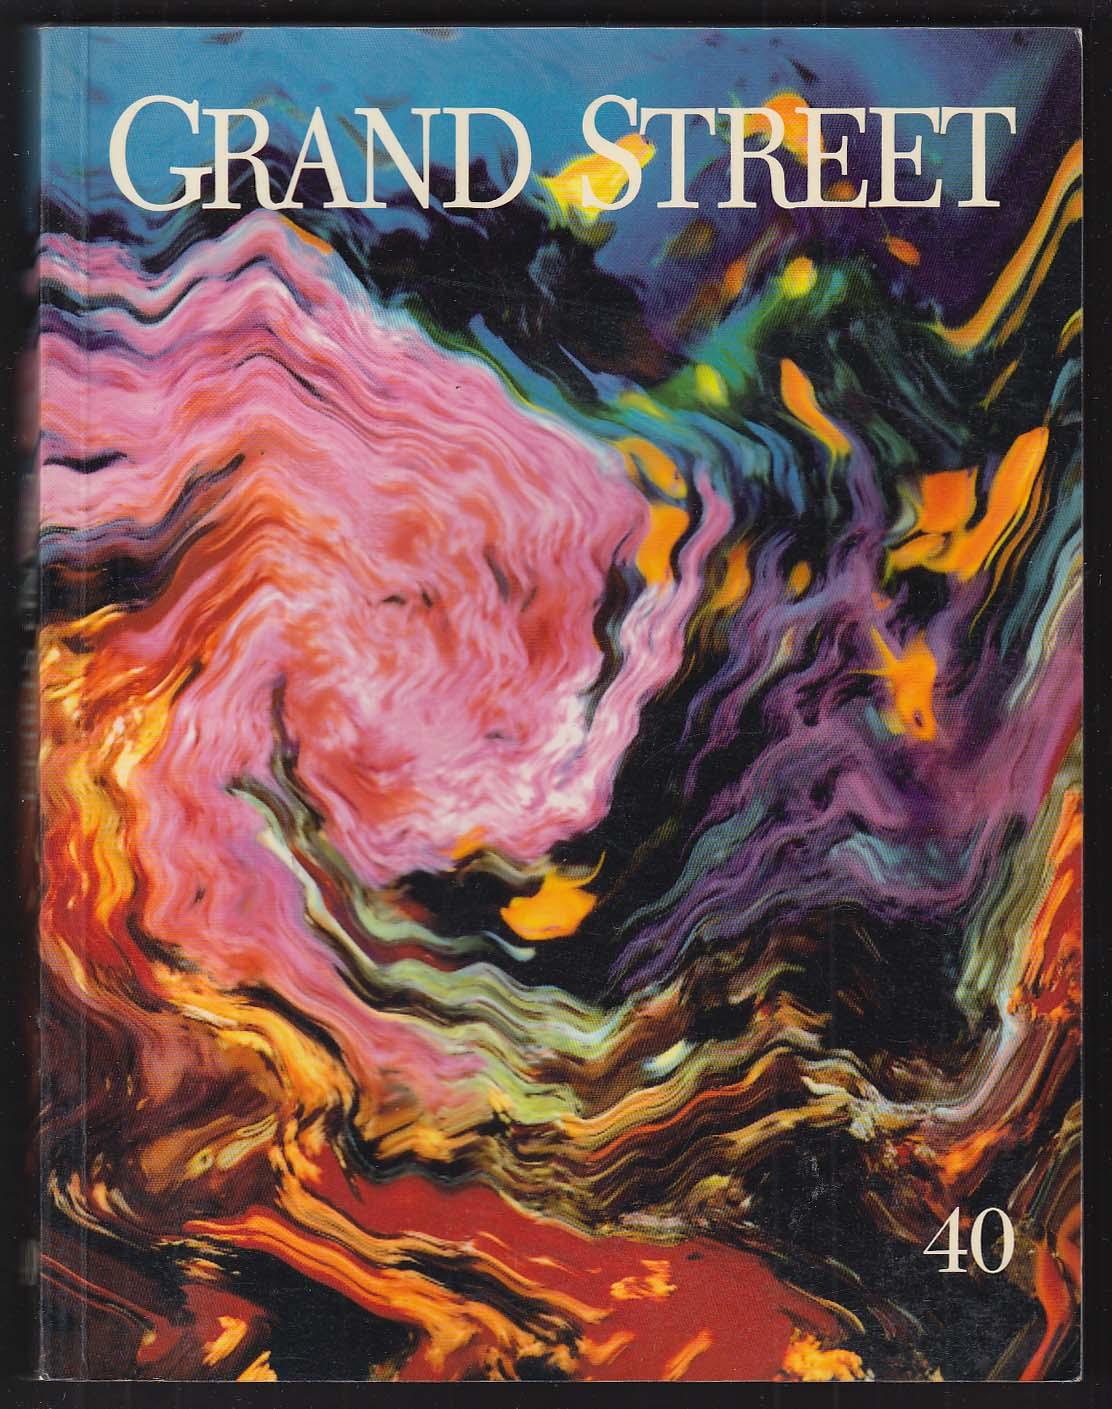 GRAND STREET #40 Robert Frank Marcel Proust Umberto Eco + 1991